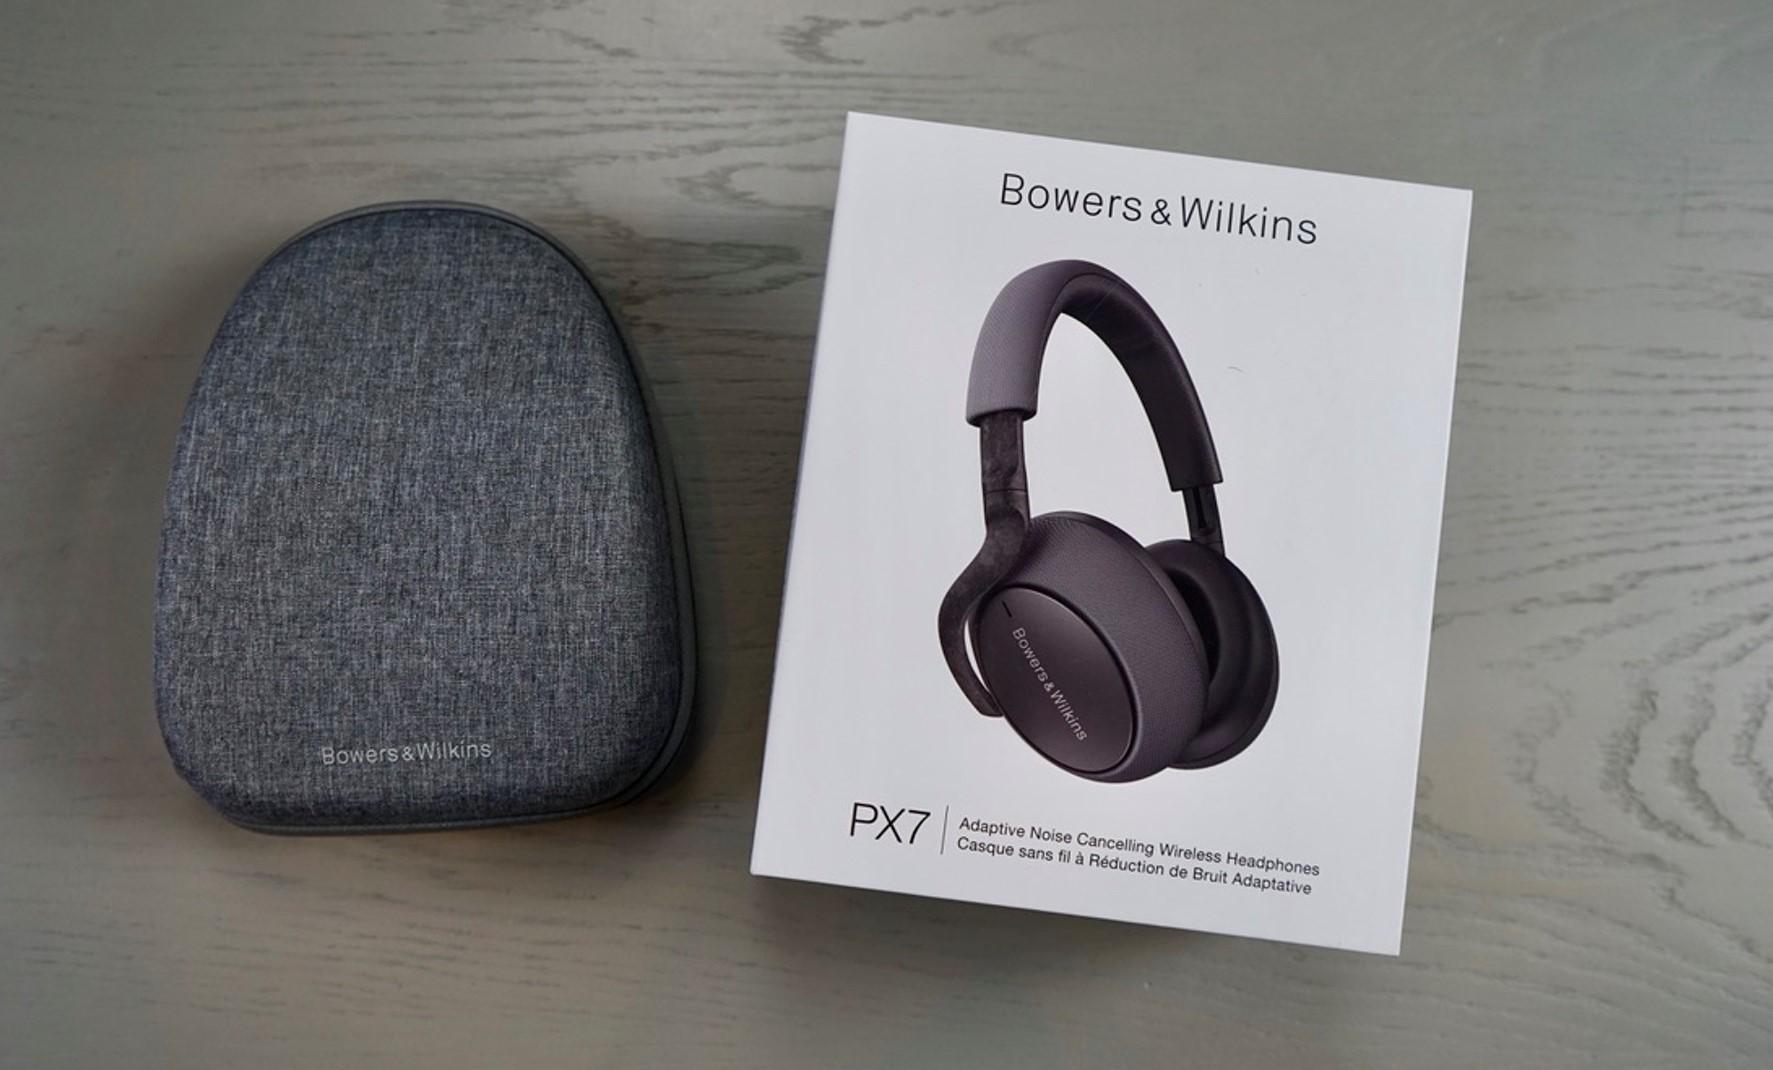 Звучание Bowers & Wilkins PX7